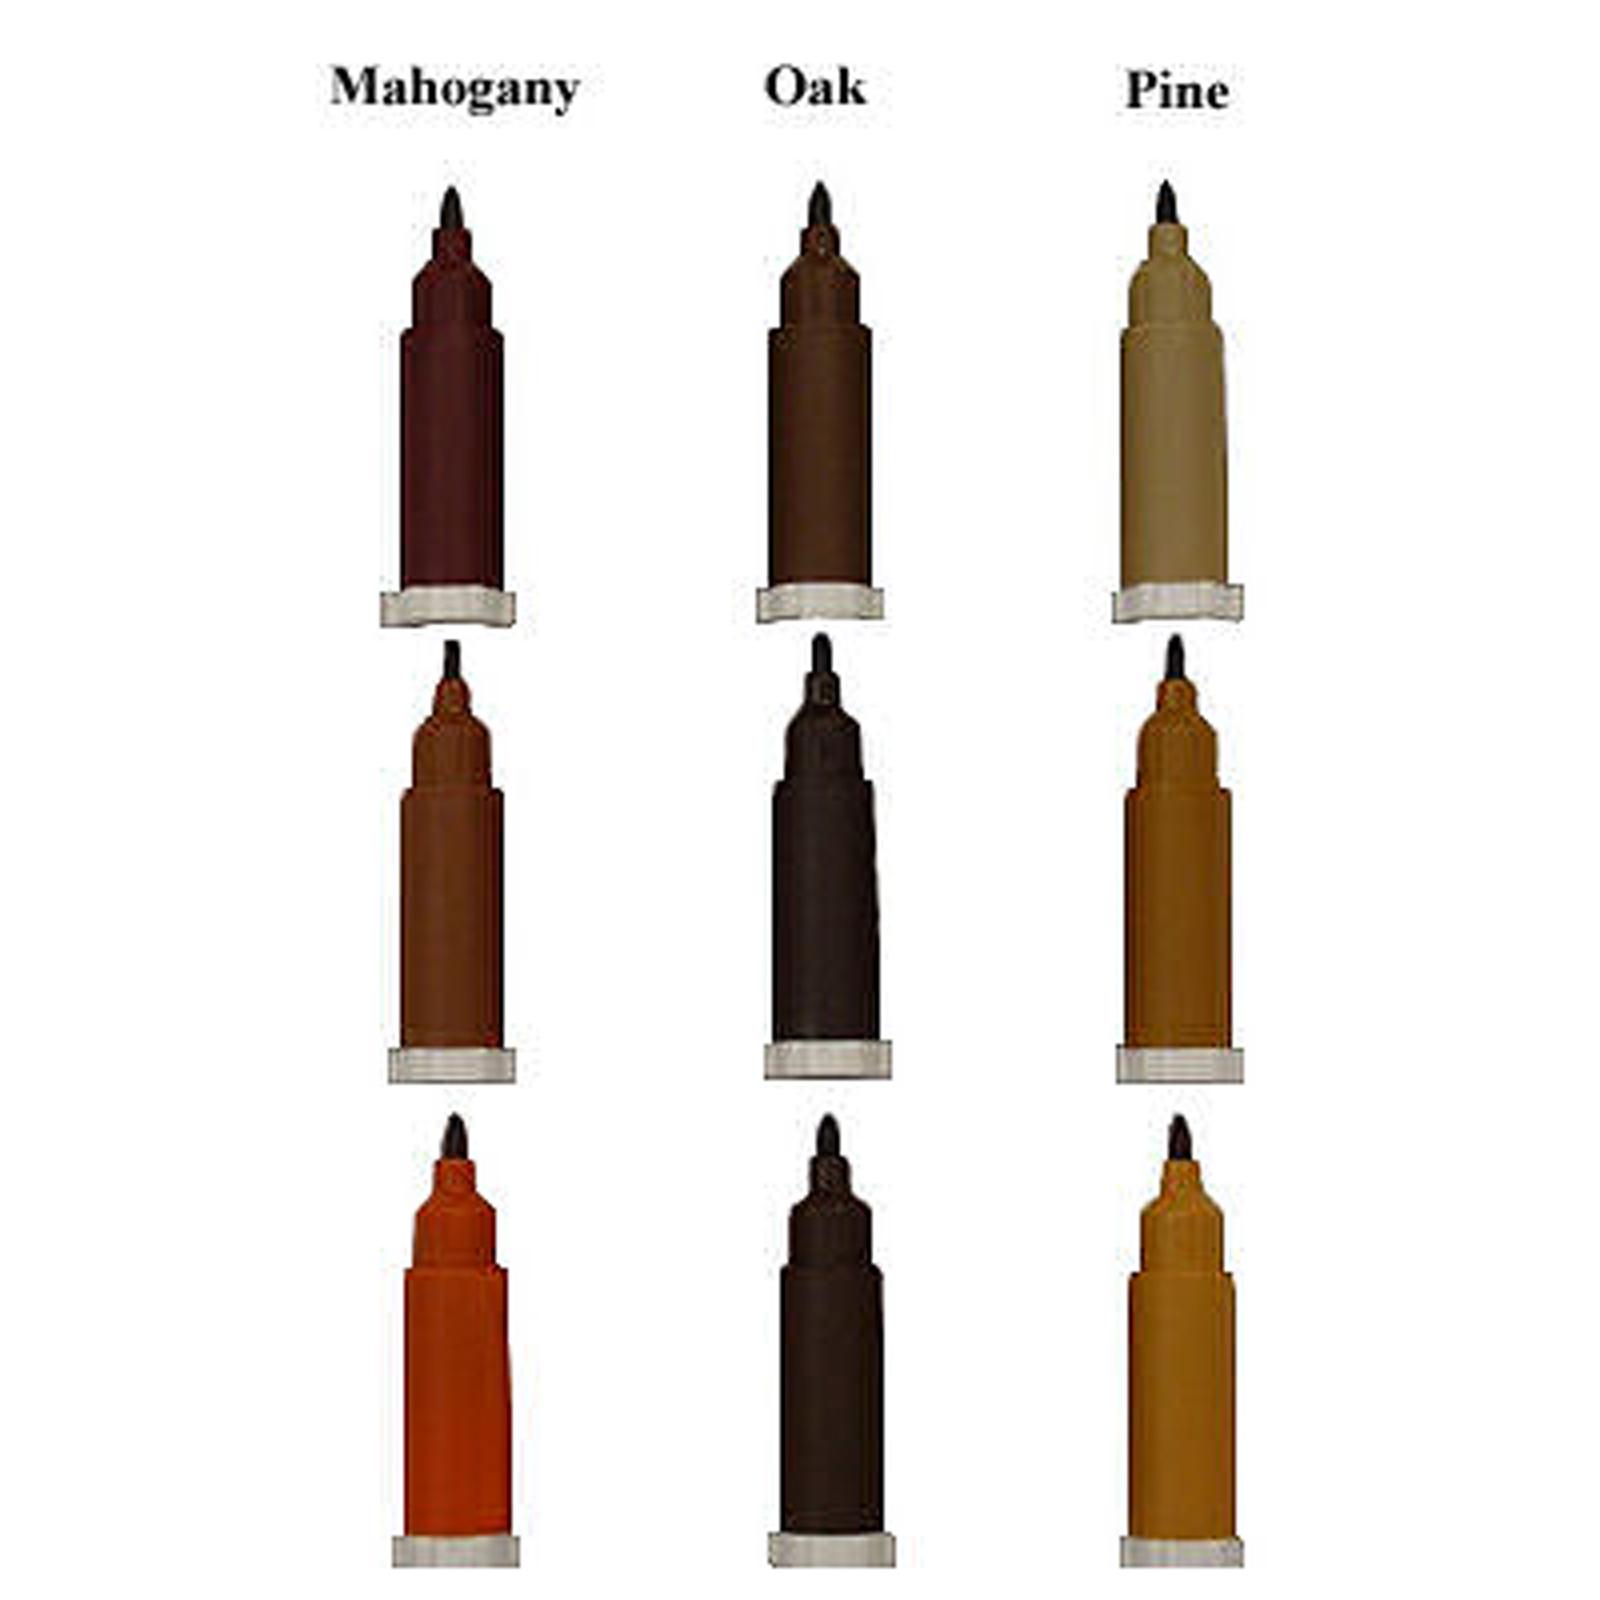 New Liberon 3 Part Wood Touch Up Pen Mahogany Oak Pine